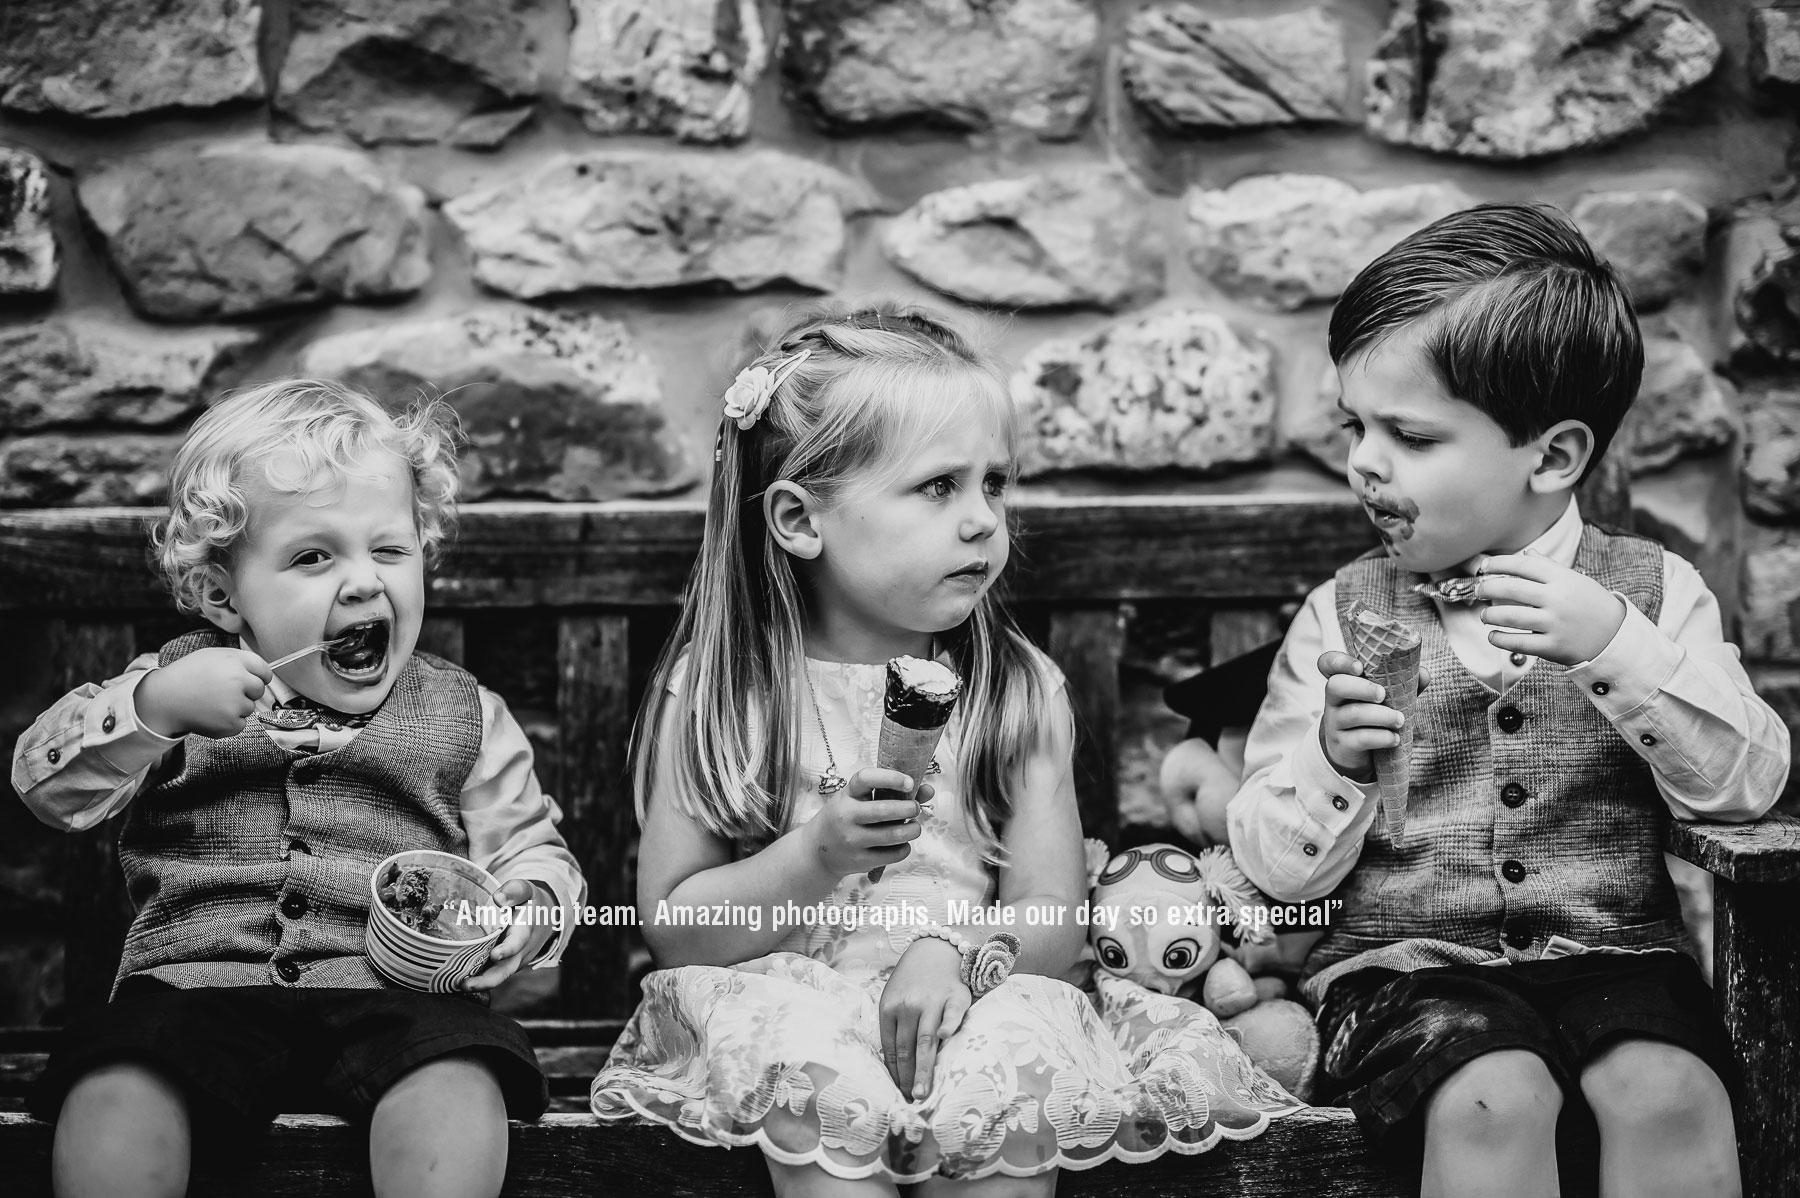 kids eating ice cream at a wedding